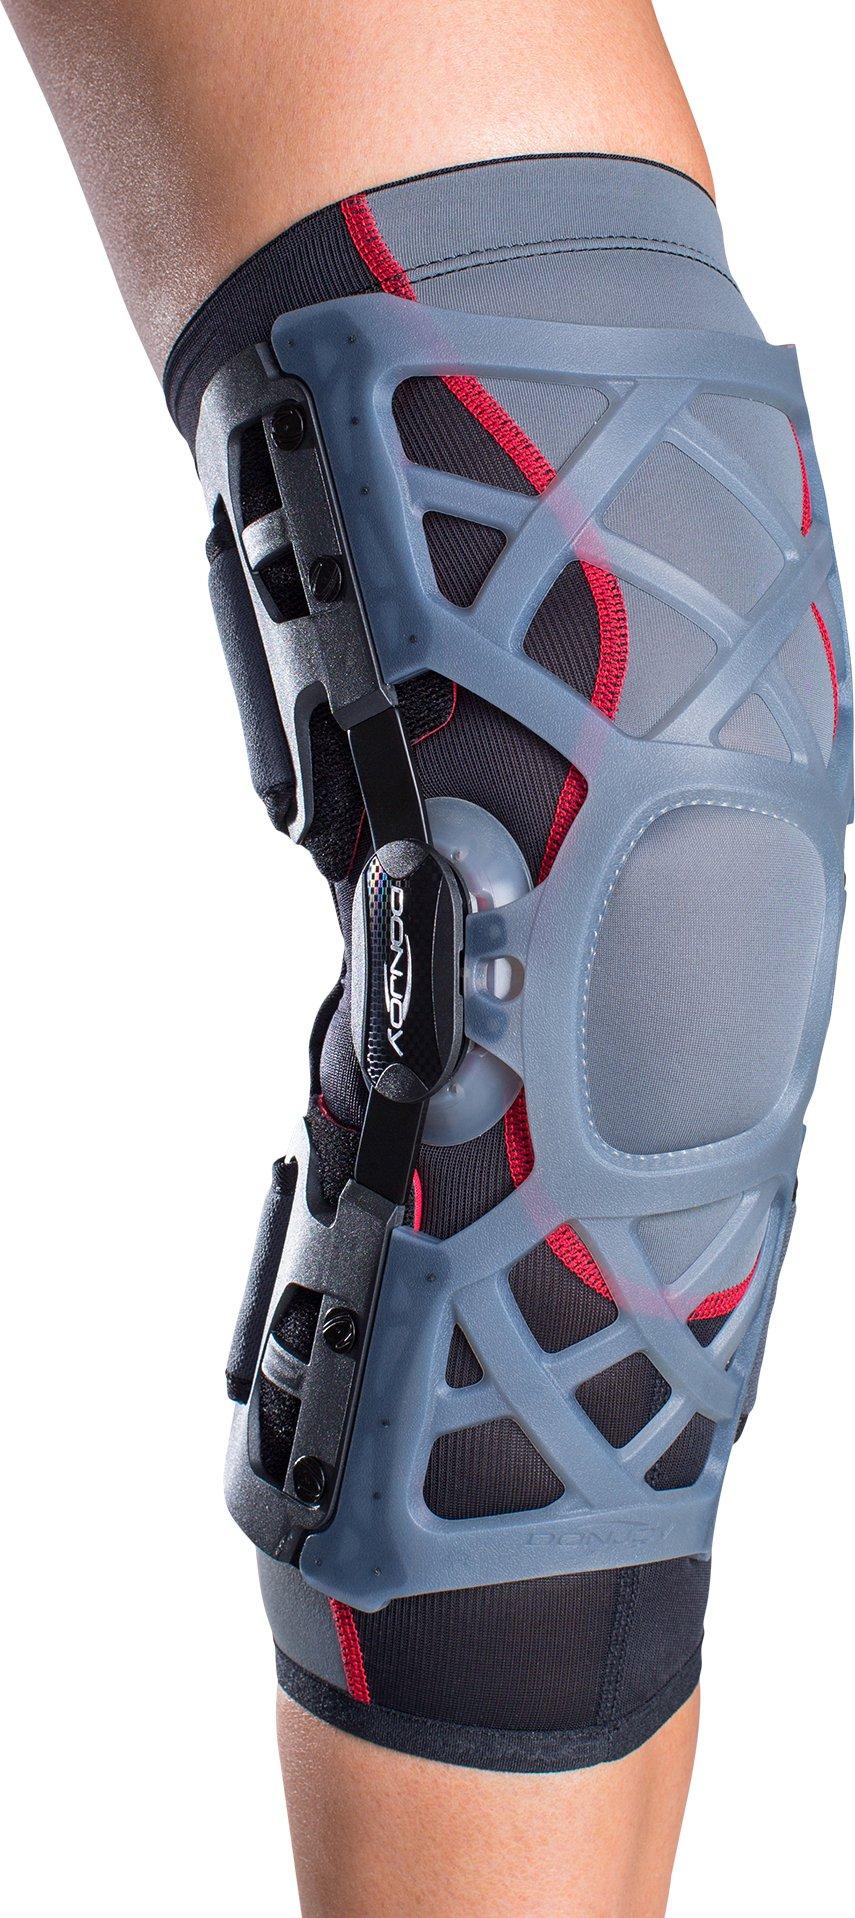 DonJoy OA (Osteoarthritis) Reaction WEB Knee Support Brace: Medial Right/Lateral Left, Medium